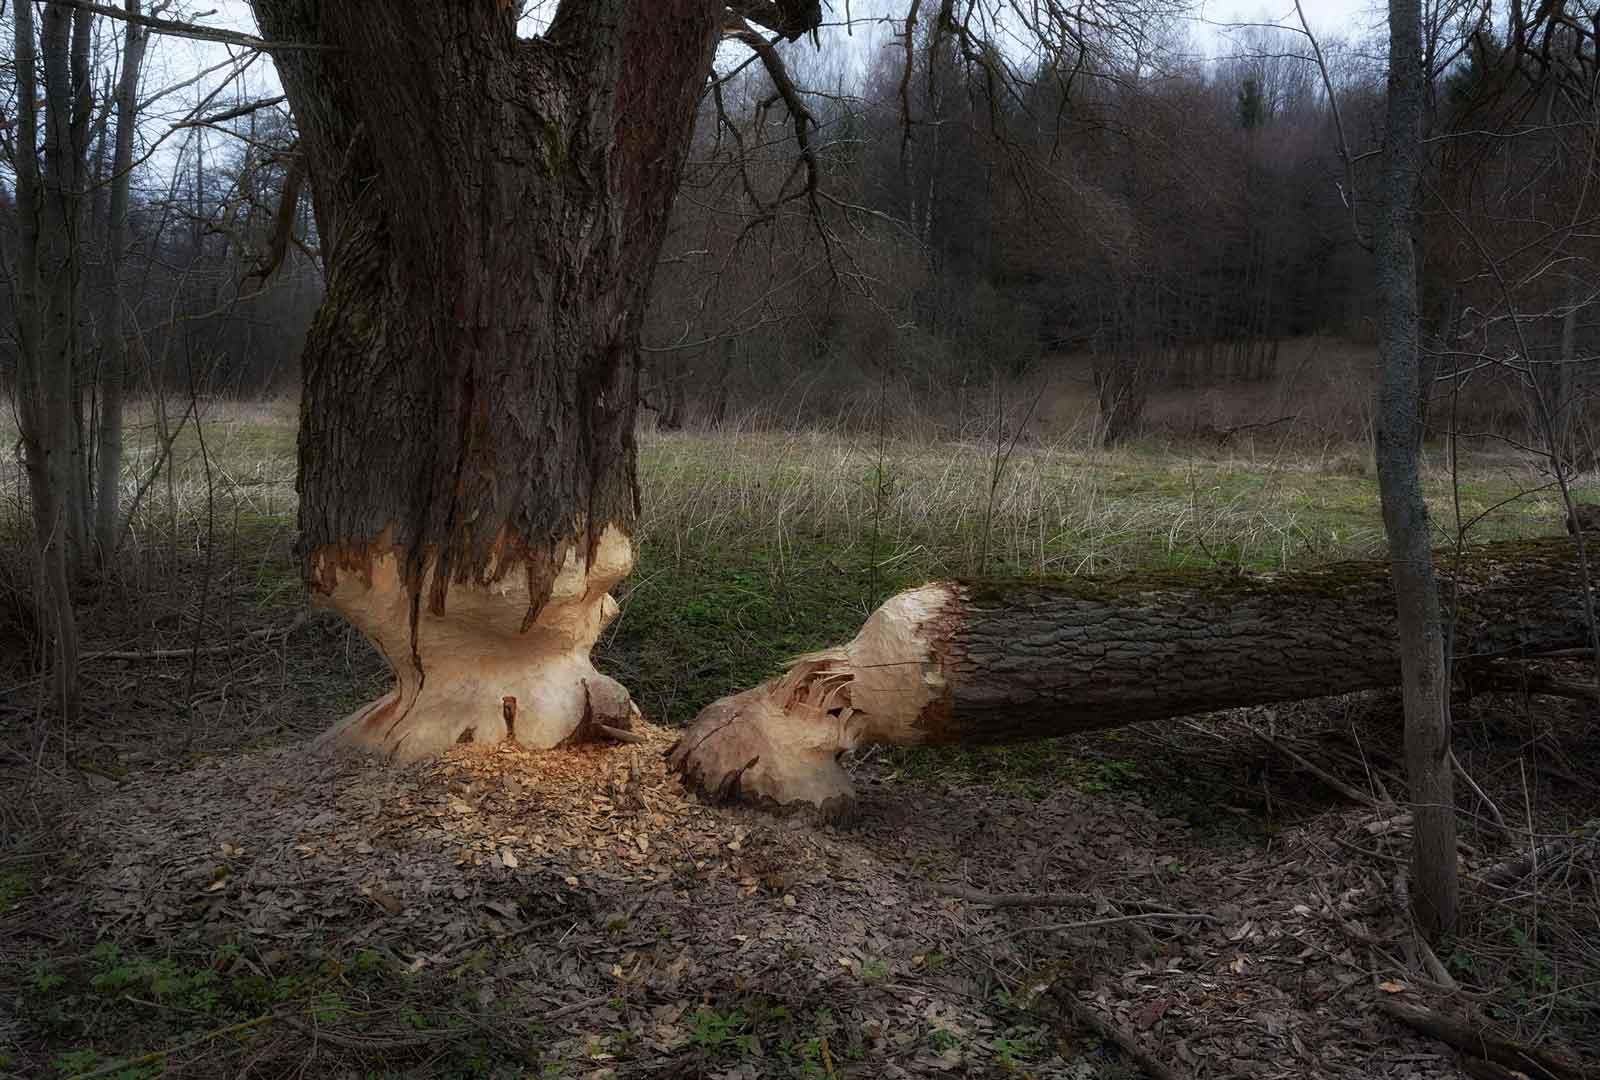 Бобры строят плотину из деревьев